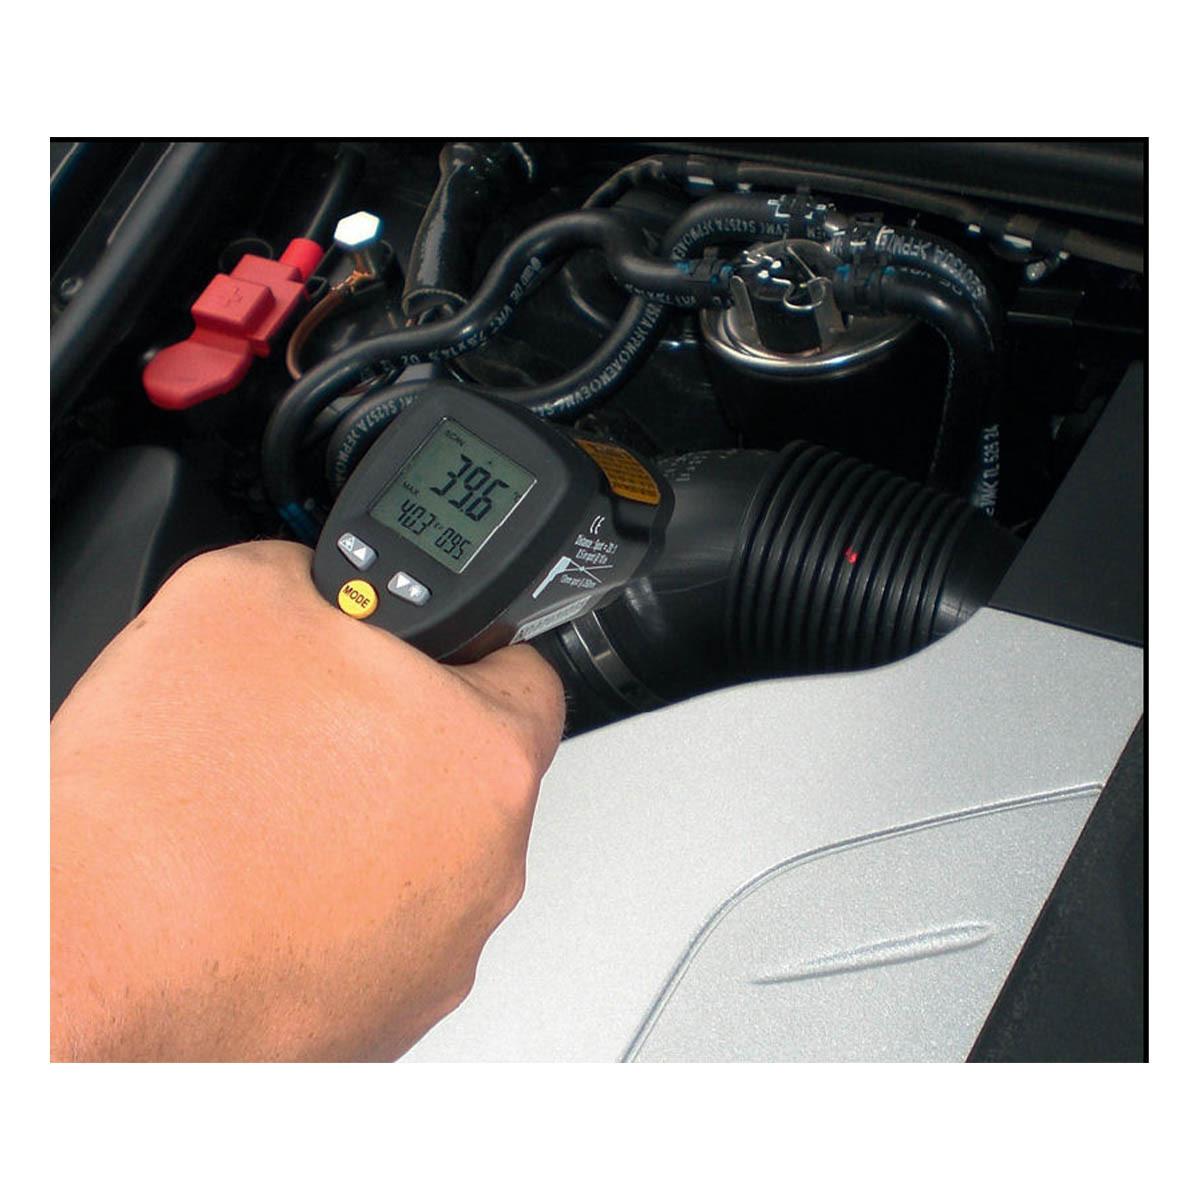 31-1124-infrarot-thermometer-scantemp-485-anwendung6-1200x1200px.jpg